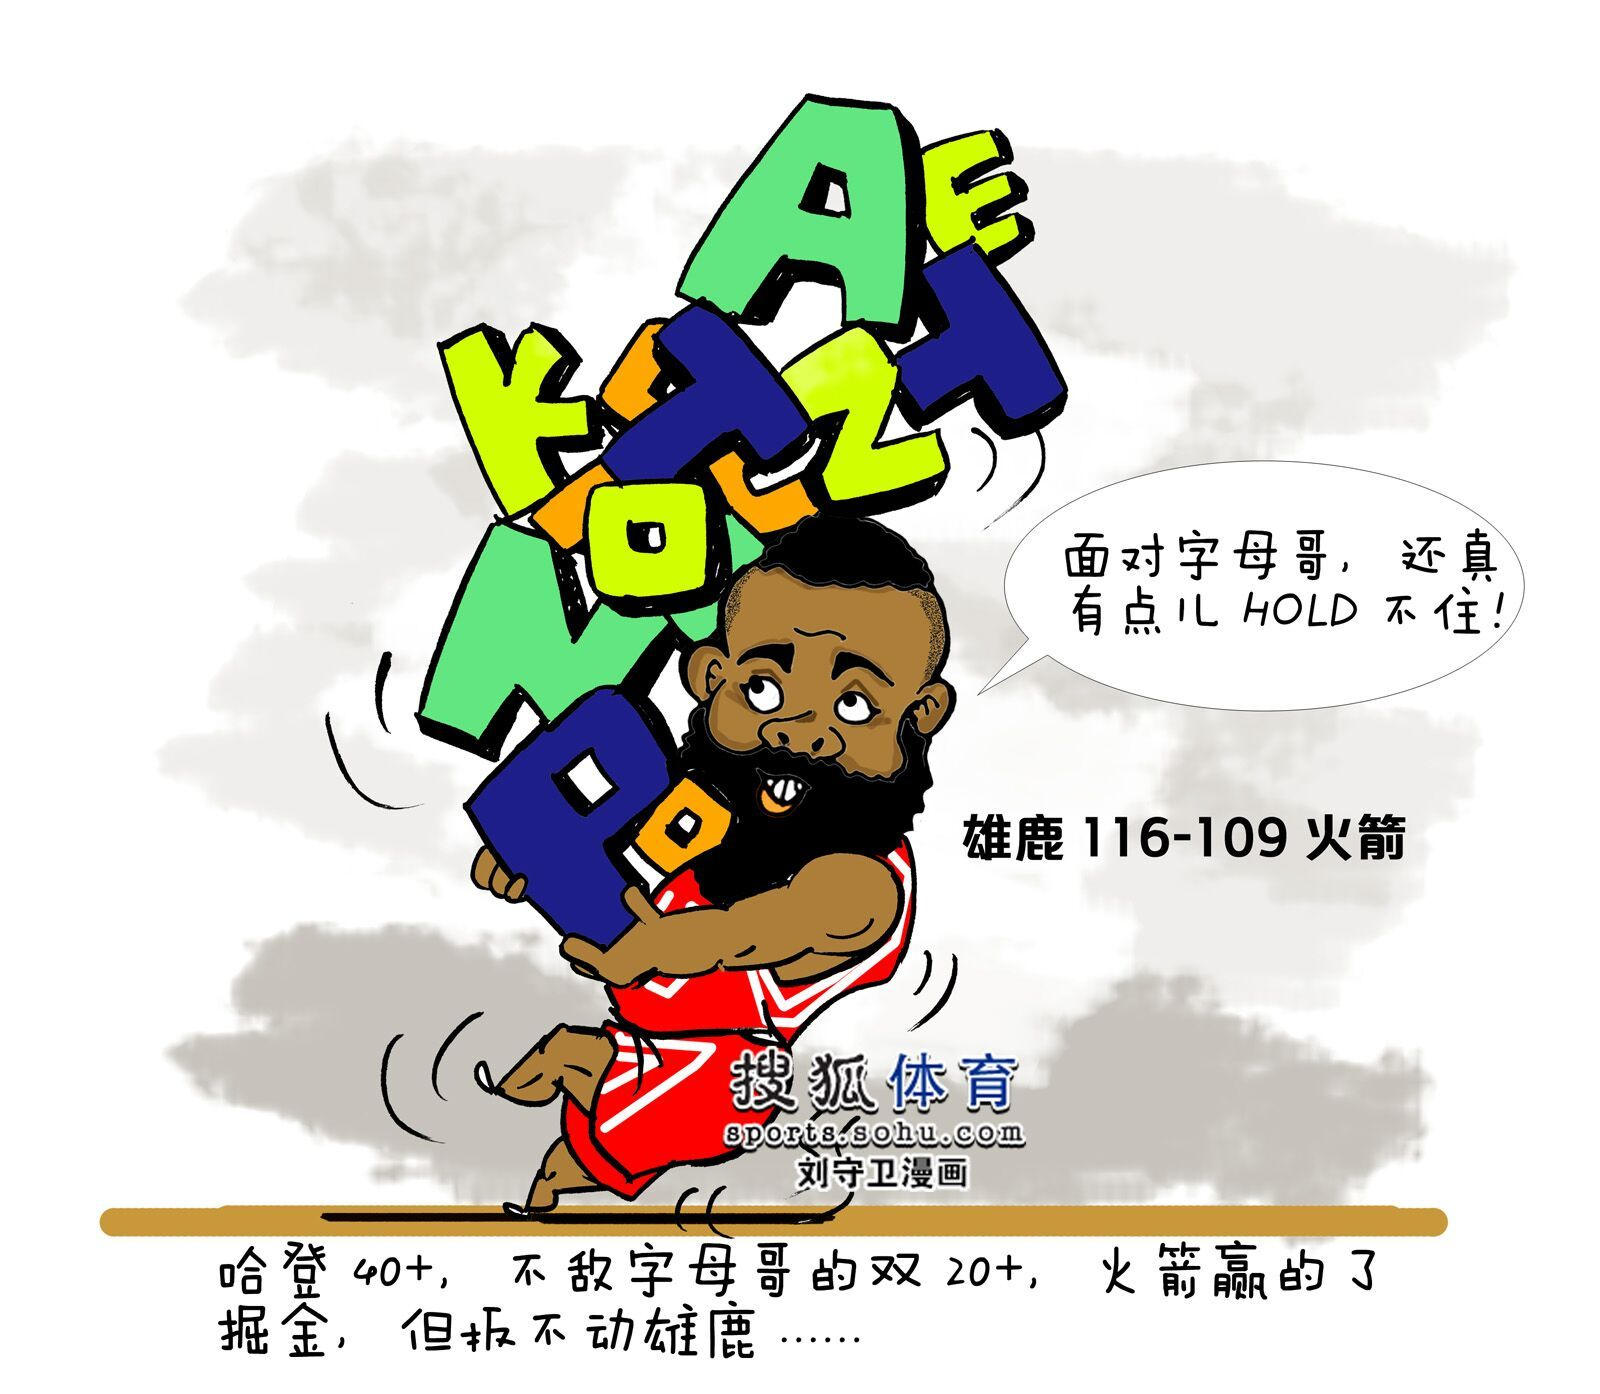 NBA漫画:1819赛季NBA哈登40+仍不敌字母哥双20